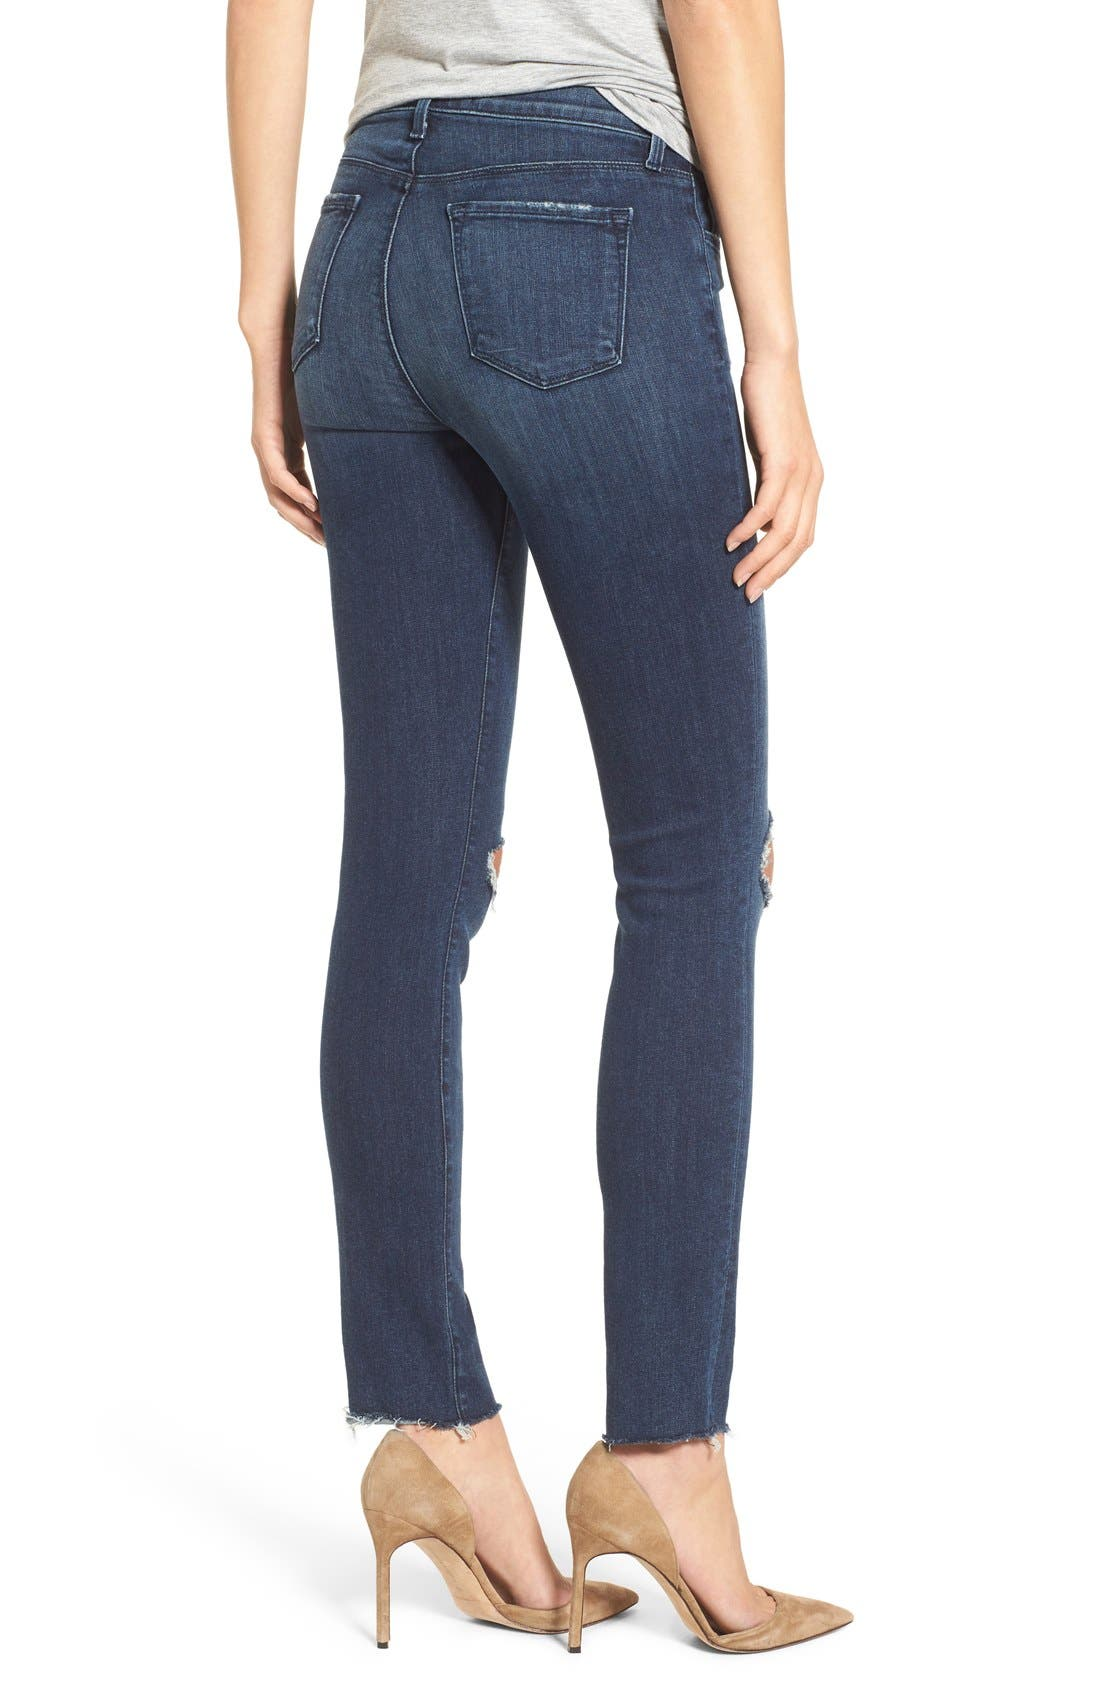 J BRAND, '811' Ankle Skinny Jeans, Alternate thumbnail 5, color, 401